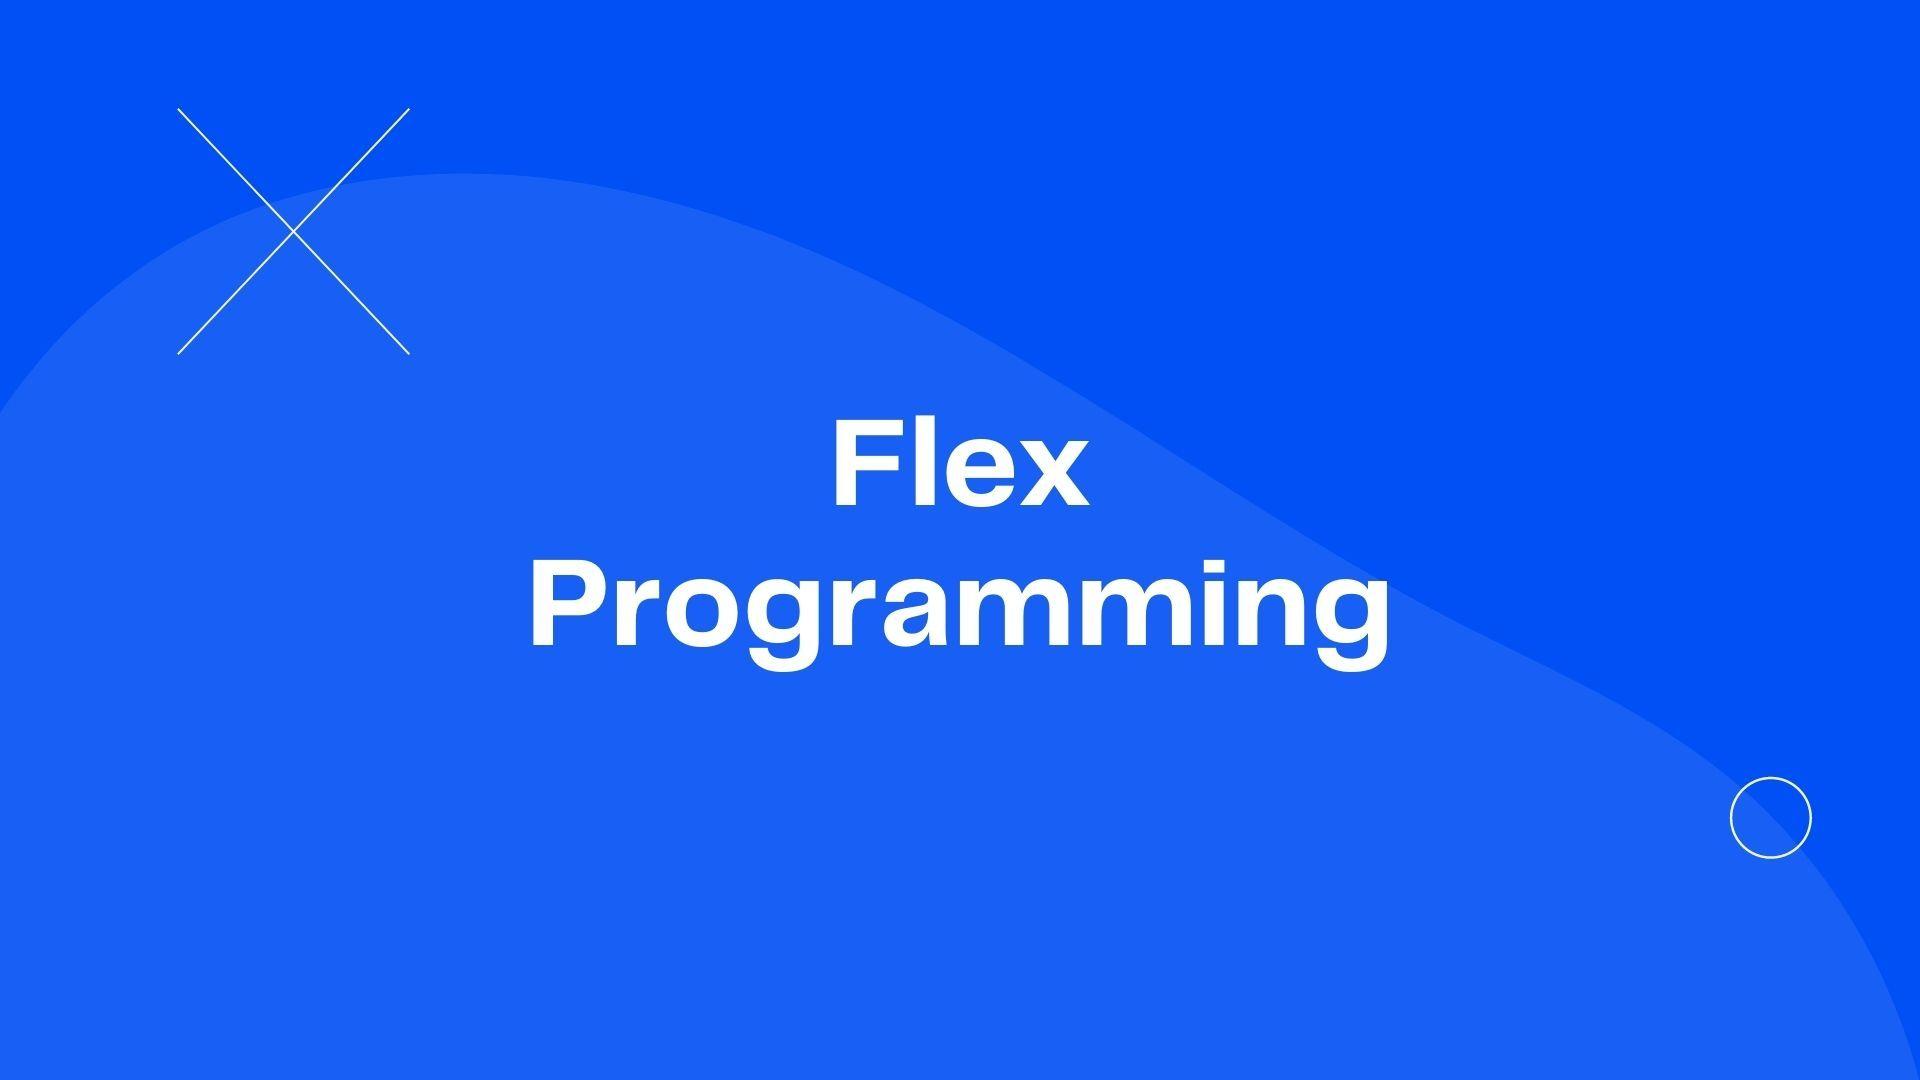 Flex Programming